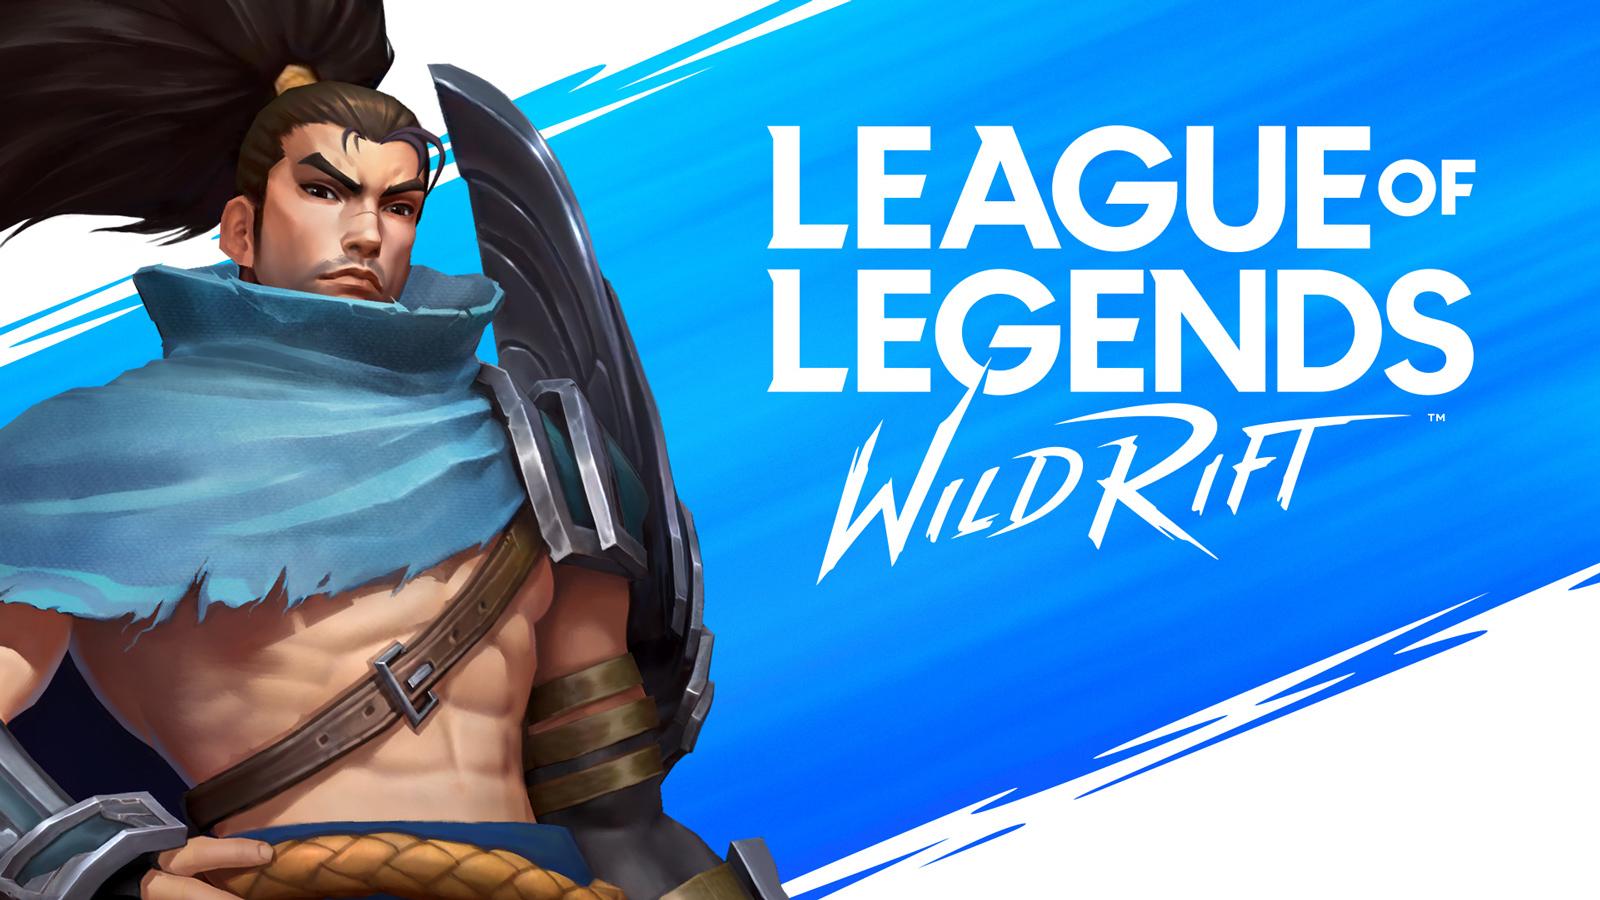 League of Legends: Wild Rift regional alpha to begin on June 5